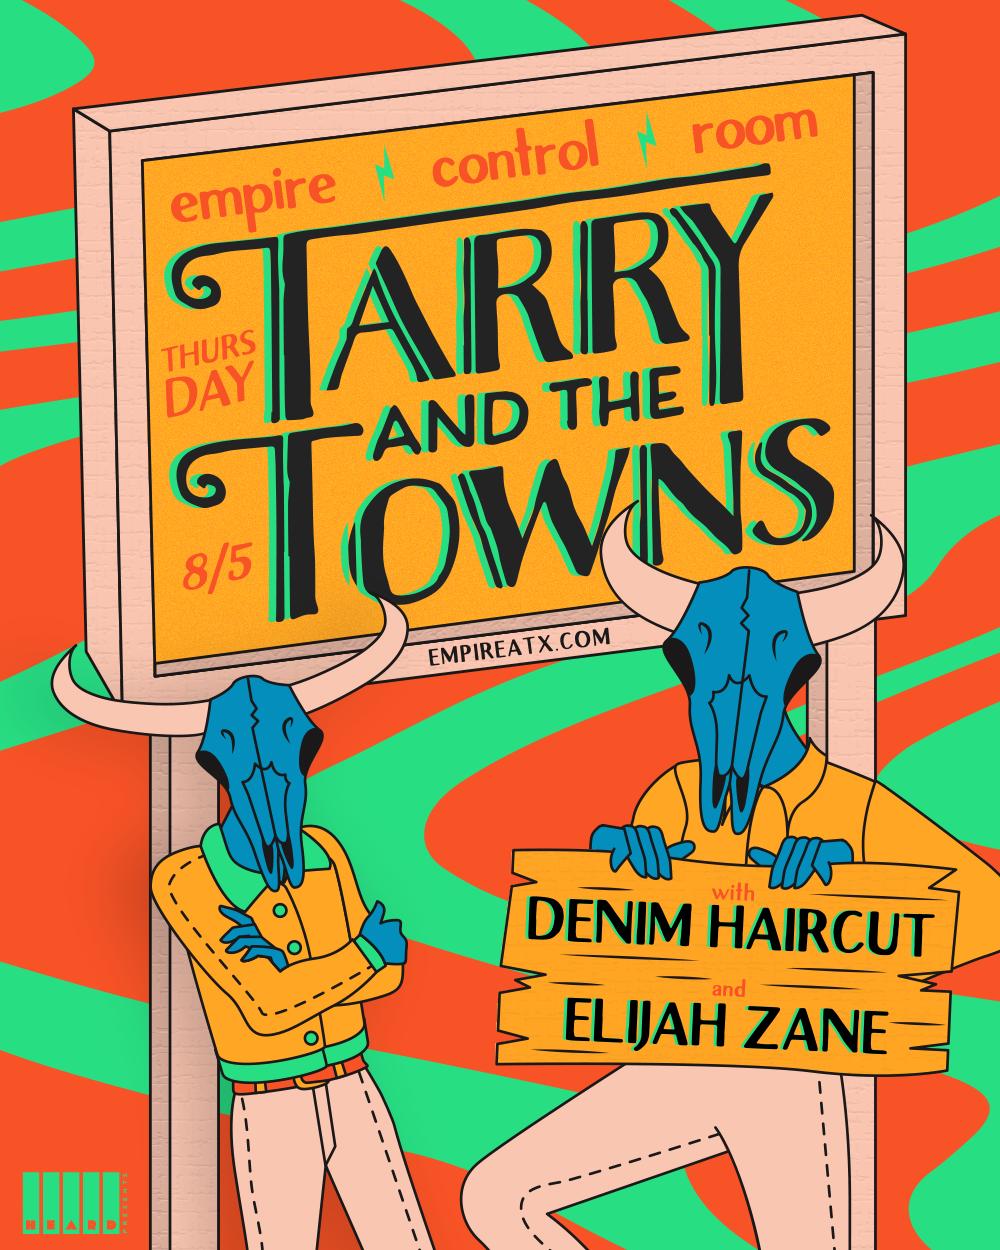 Tarry & The Towns w/ Denim Haircut, Elijah Zane: